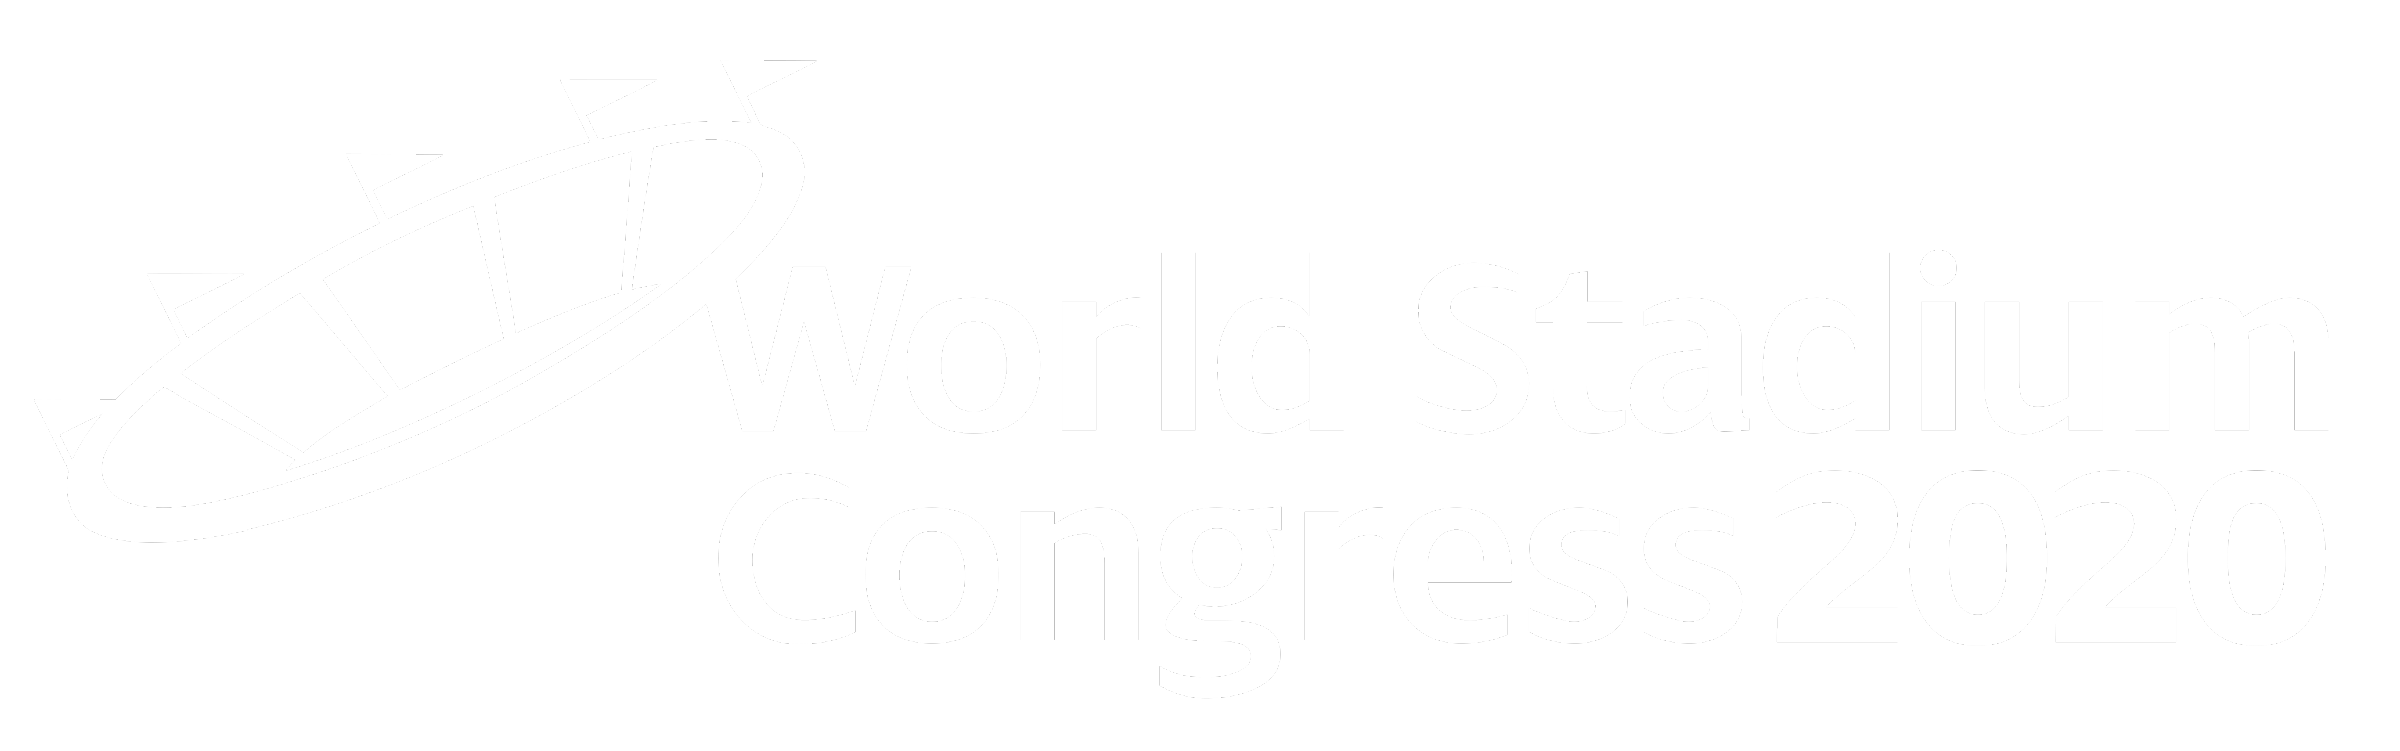 World Stadium Congress 2020